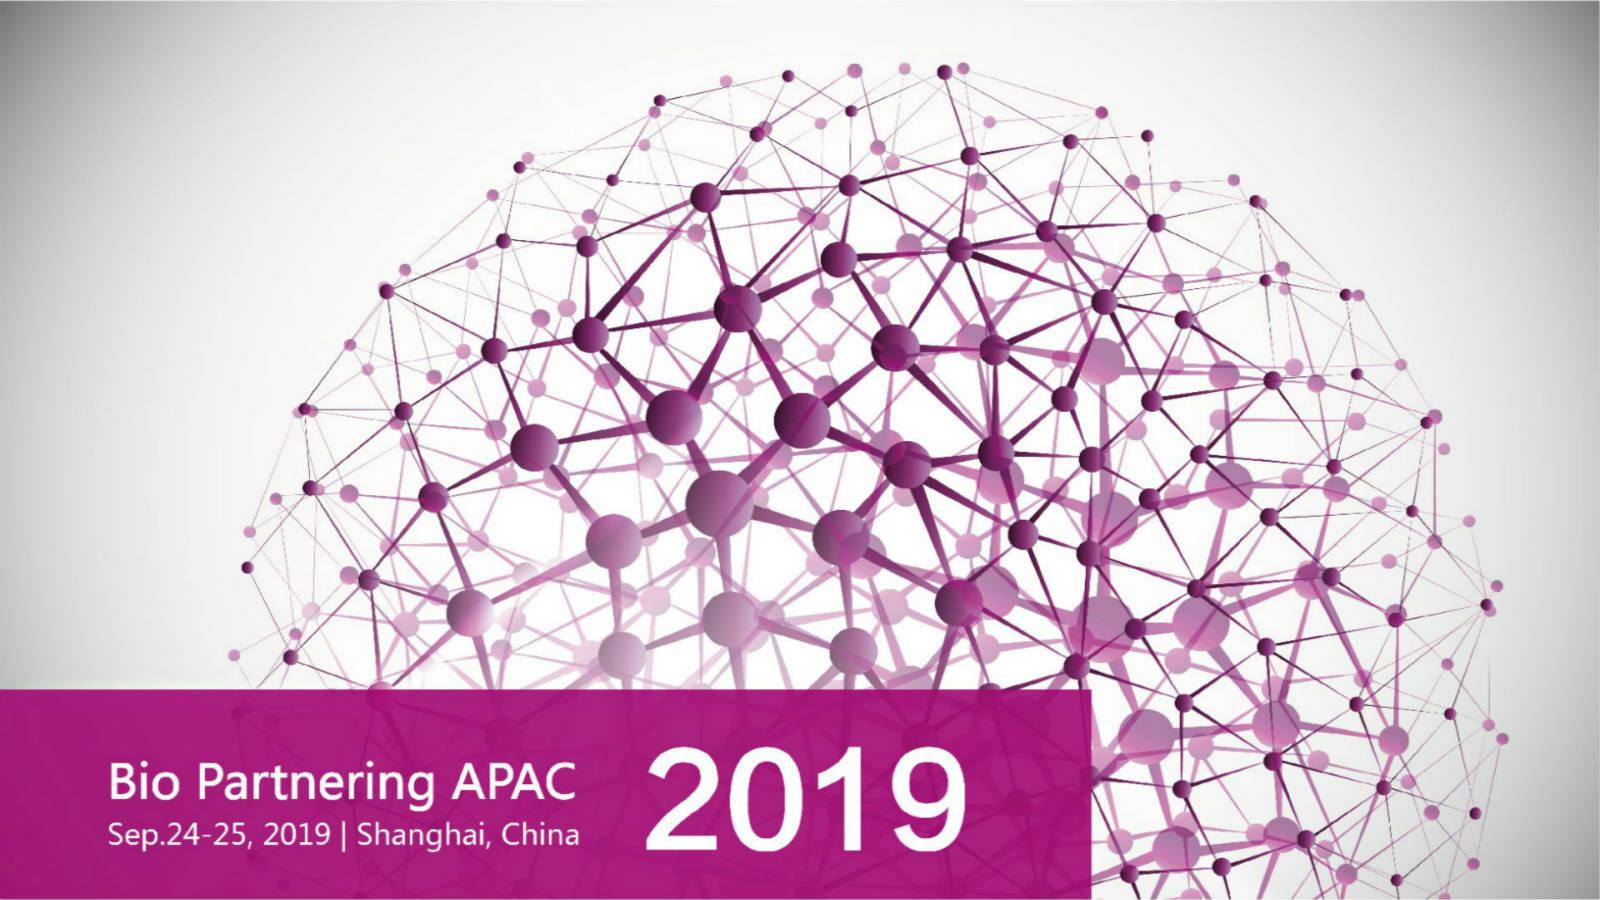 Bio Partnering APAC 2019.jpg